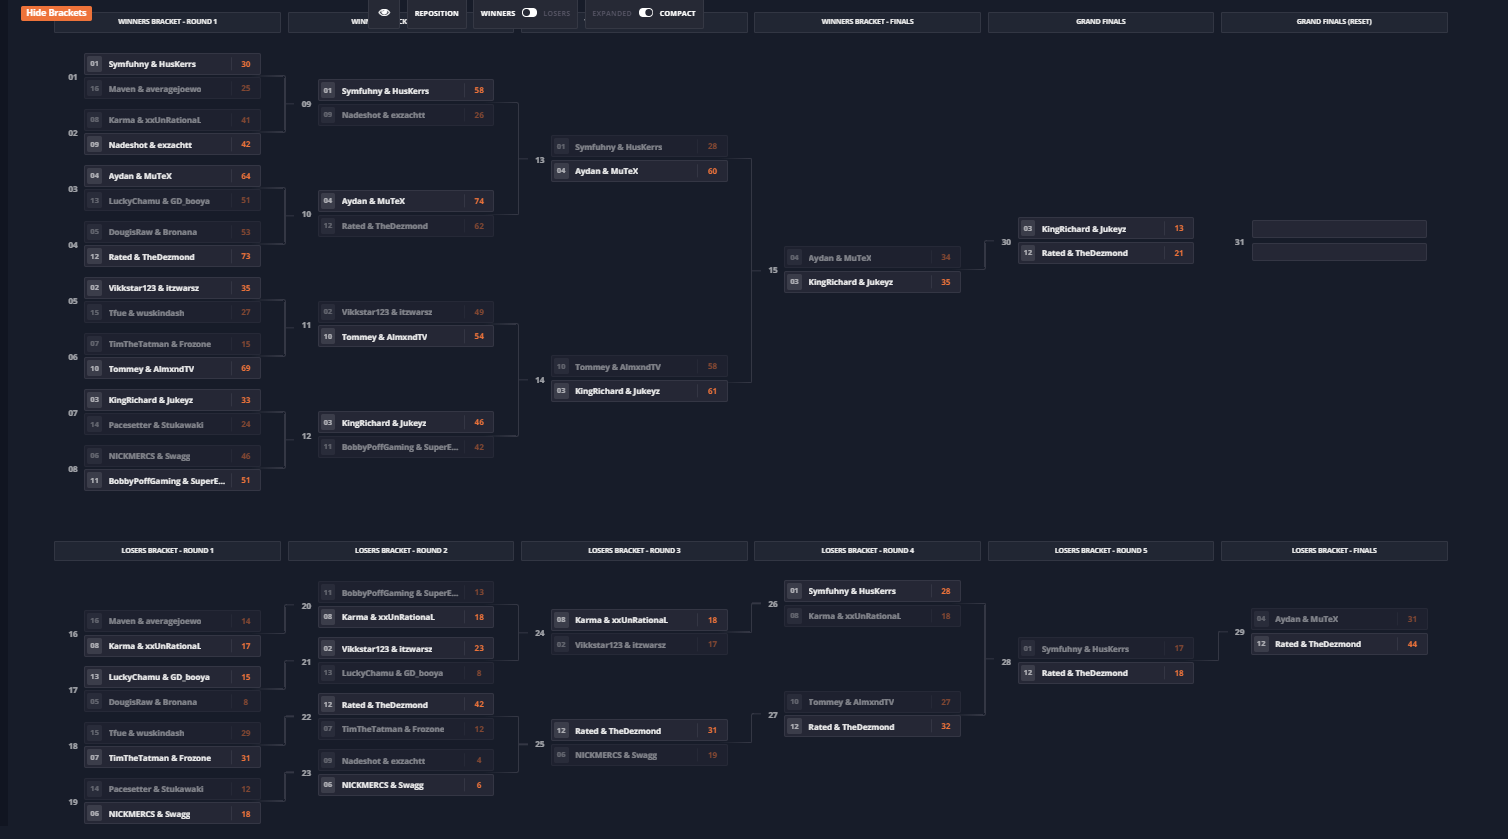 Teep's Trials Warzone tournament bracket